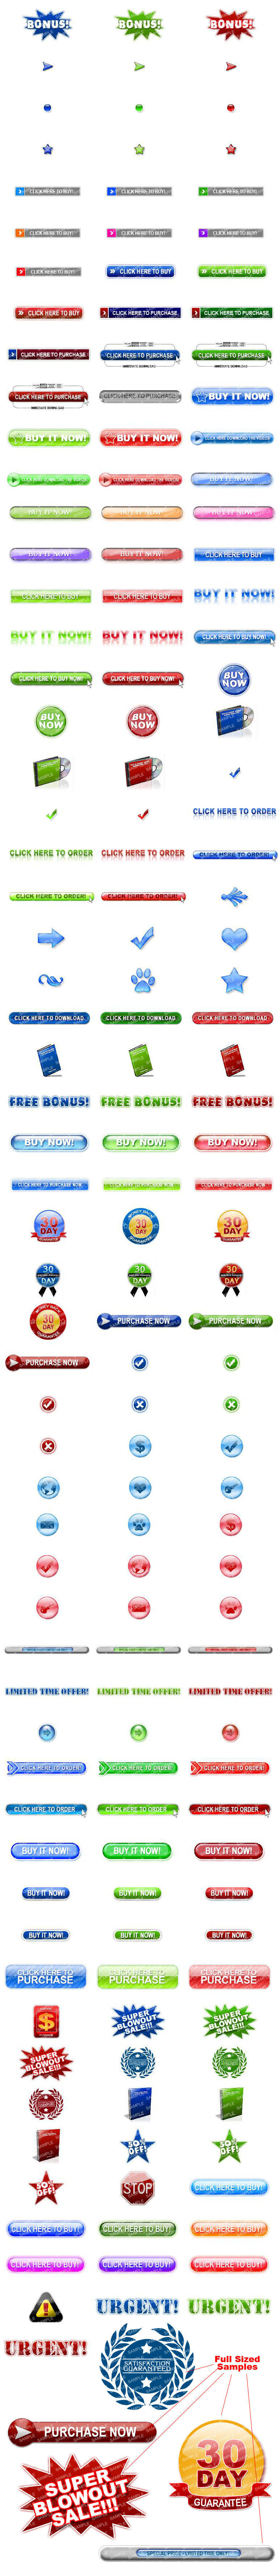 marketing plr graphics